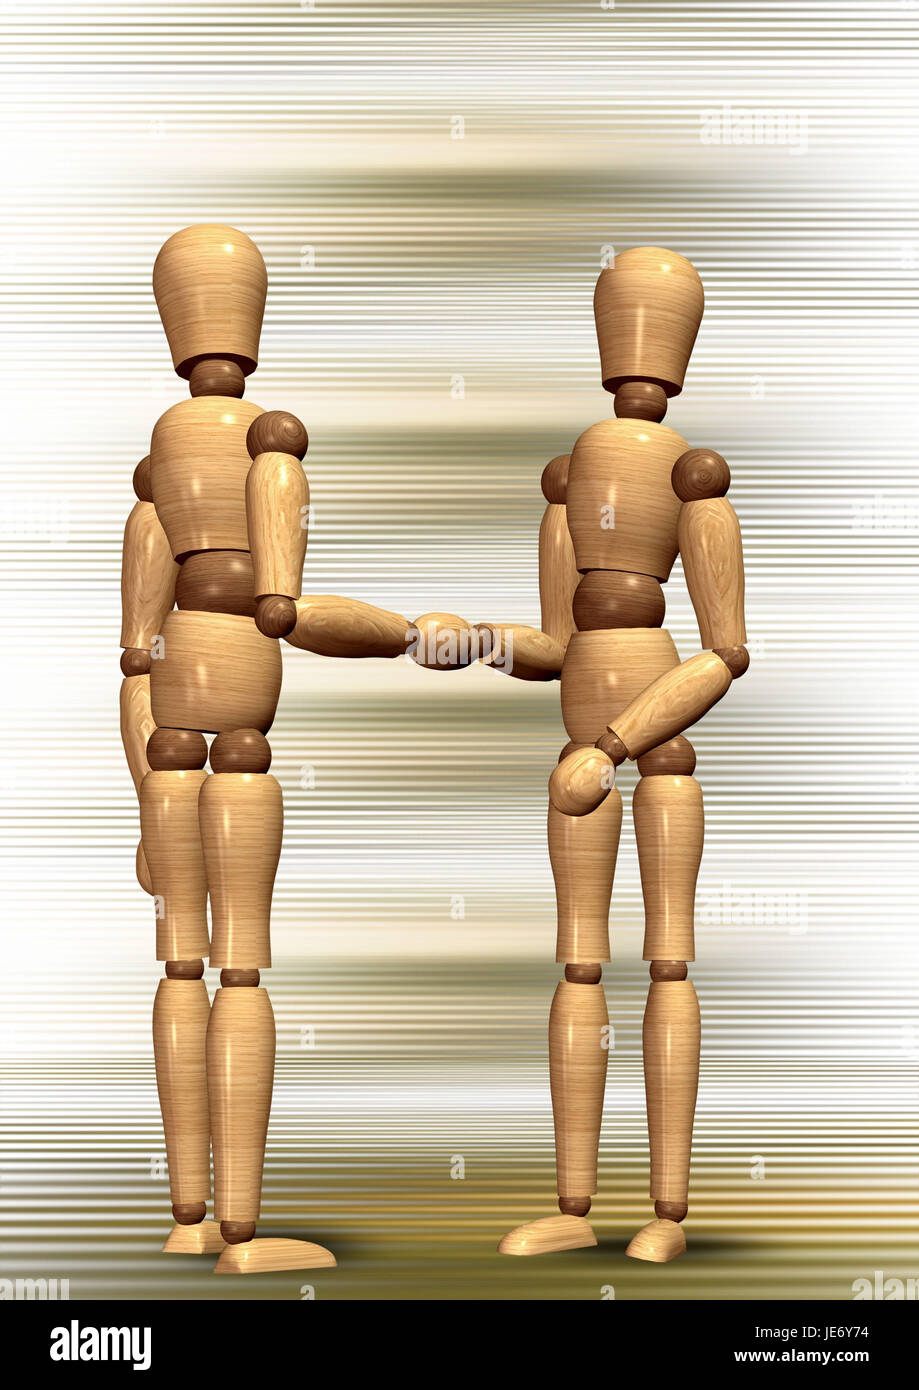 Manikins with the handshake, - Stock Image